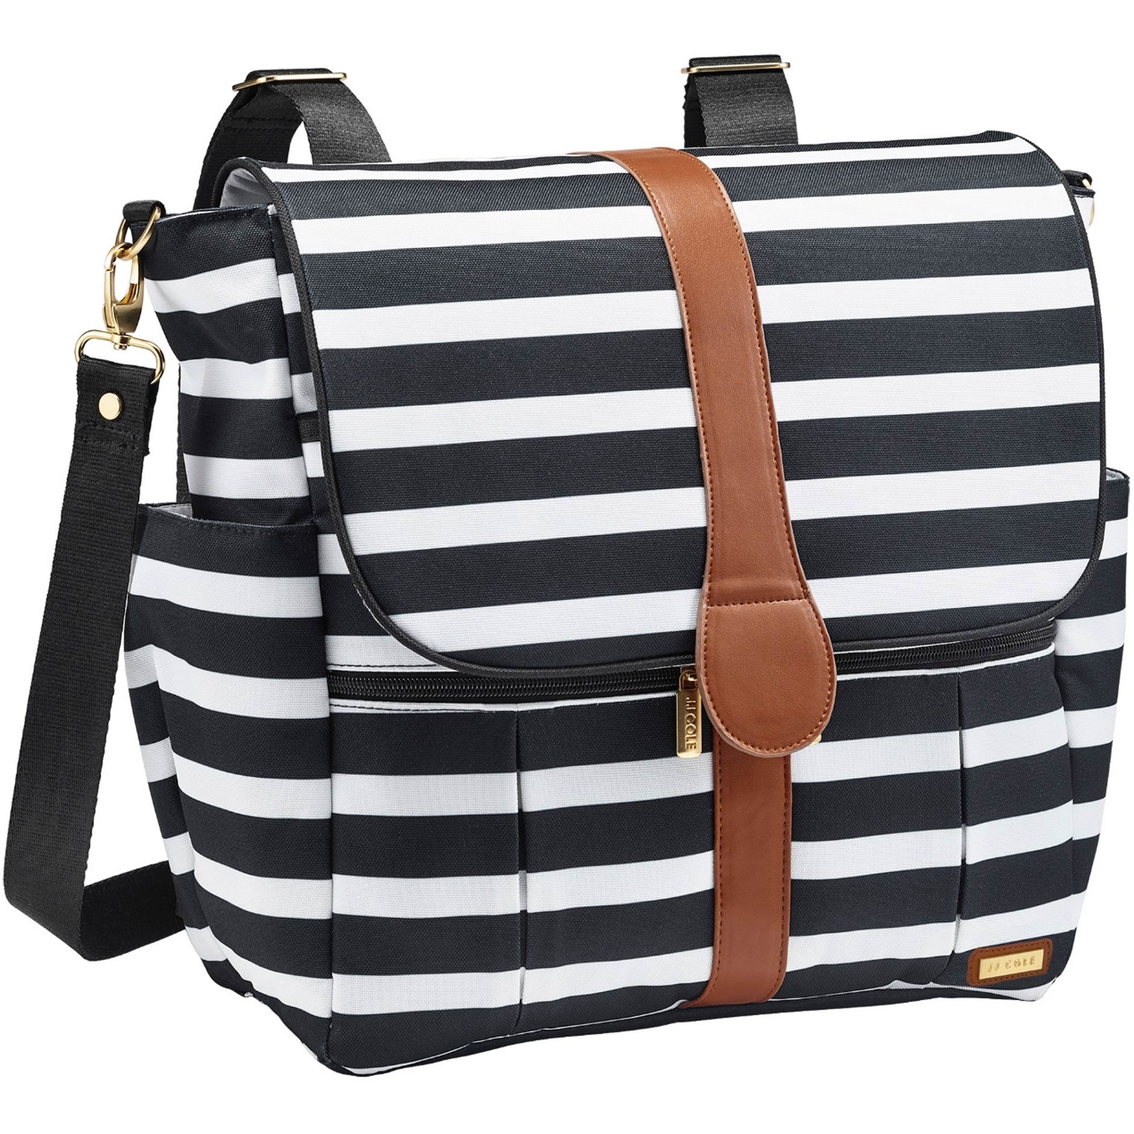 ede67f3d54a Jj Cole Caprice Backpack Diaper Bag